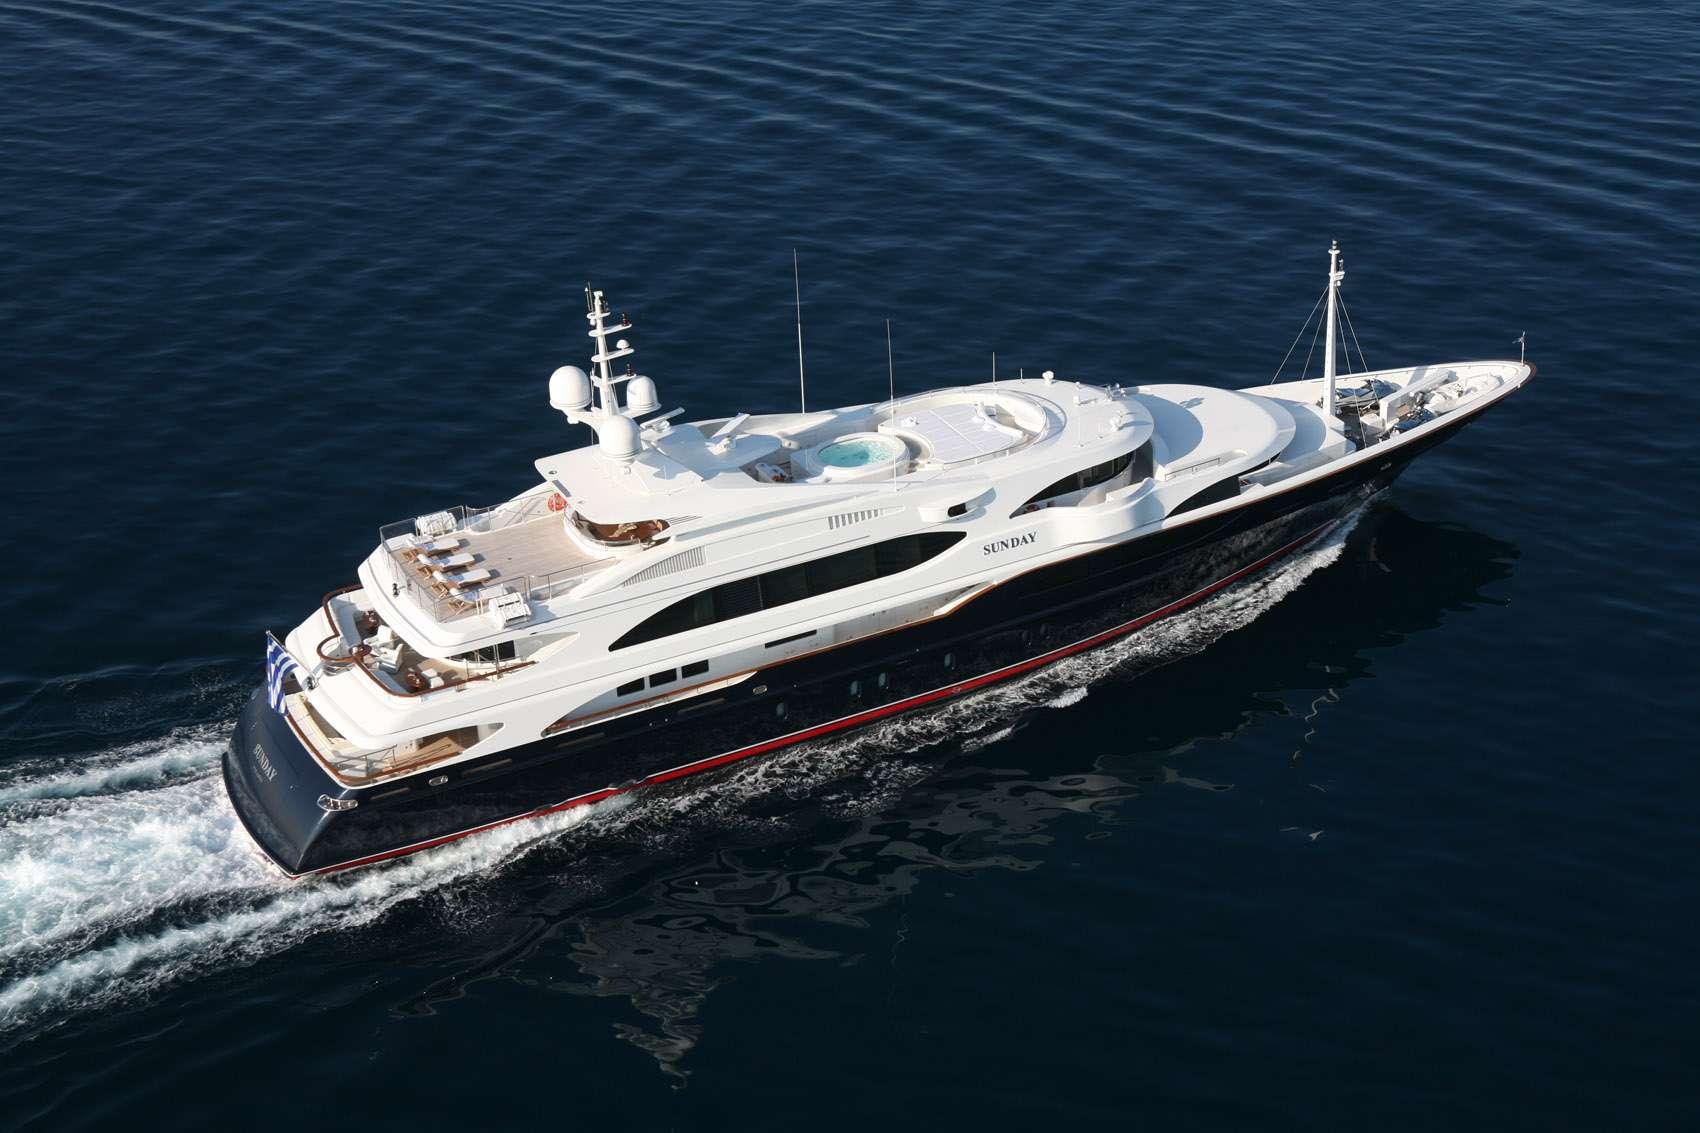 Power Yacht 'Power', 12 PAX, 15 Crew, 196.00 Ft, 59.00 Meters, Built 2006, Benetti, Refit Year 2010